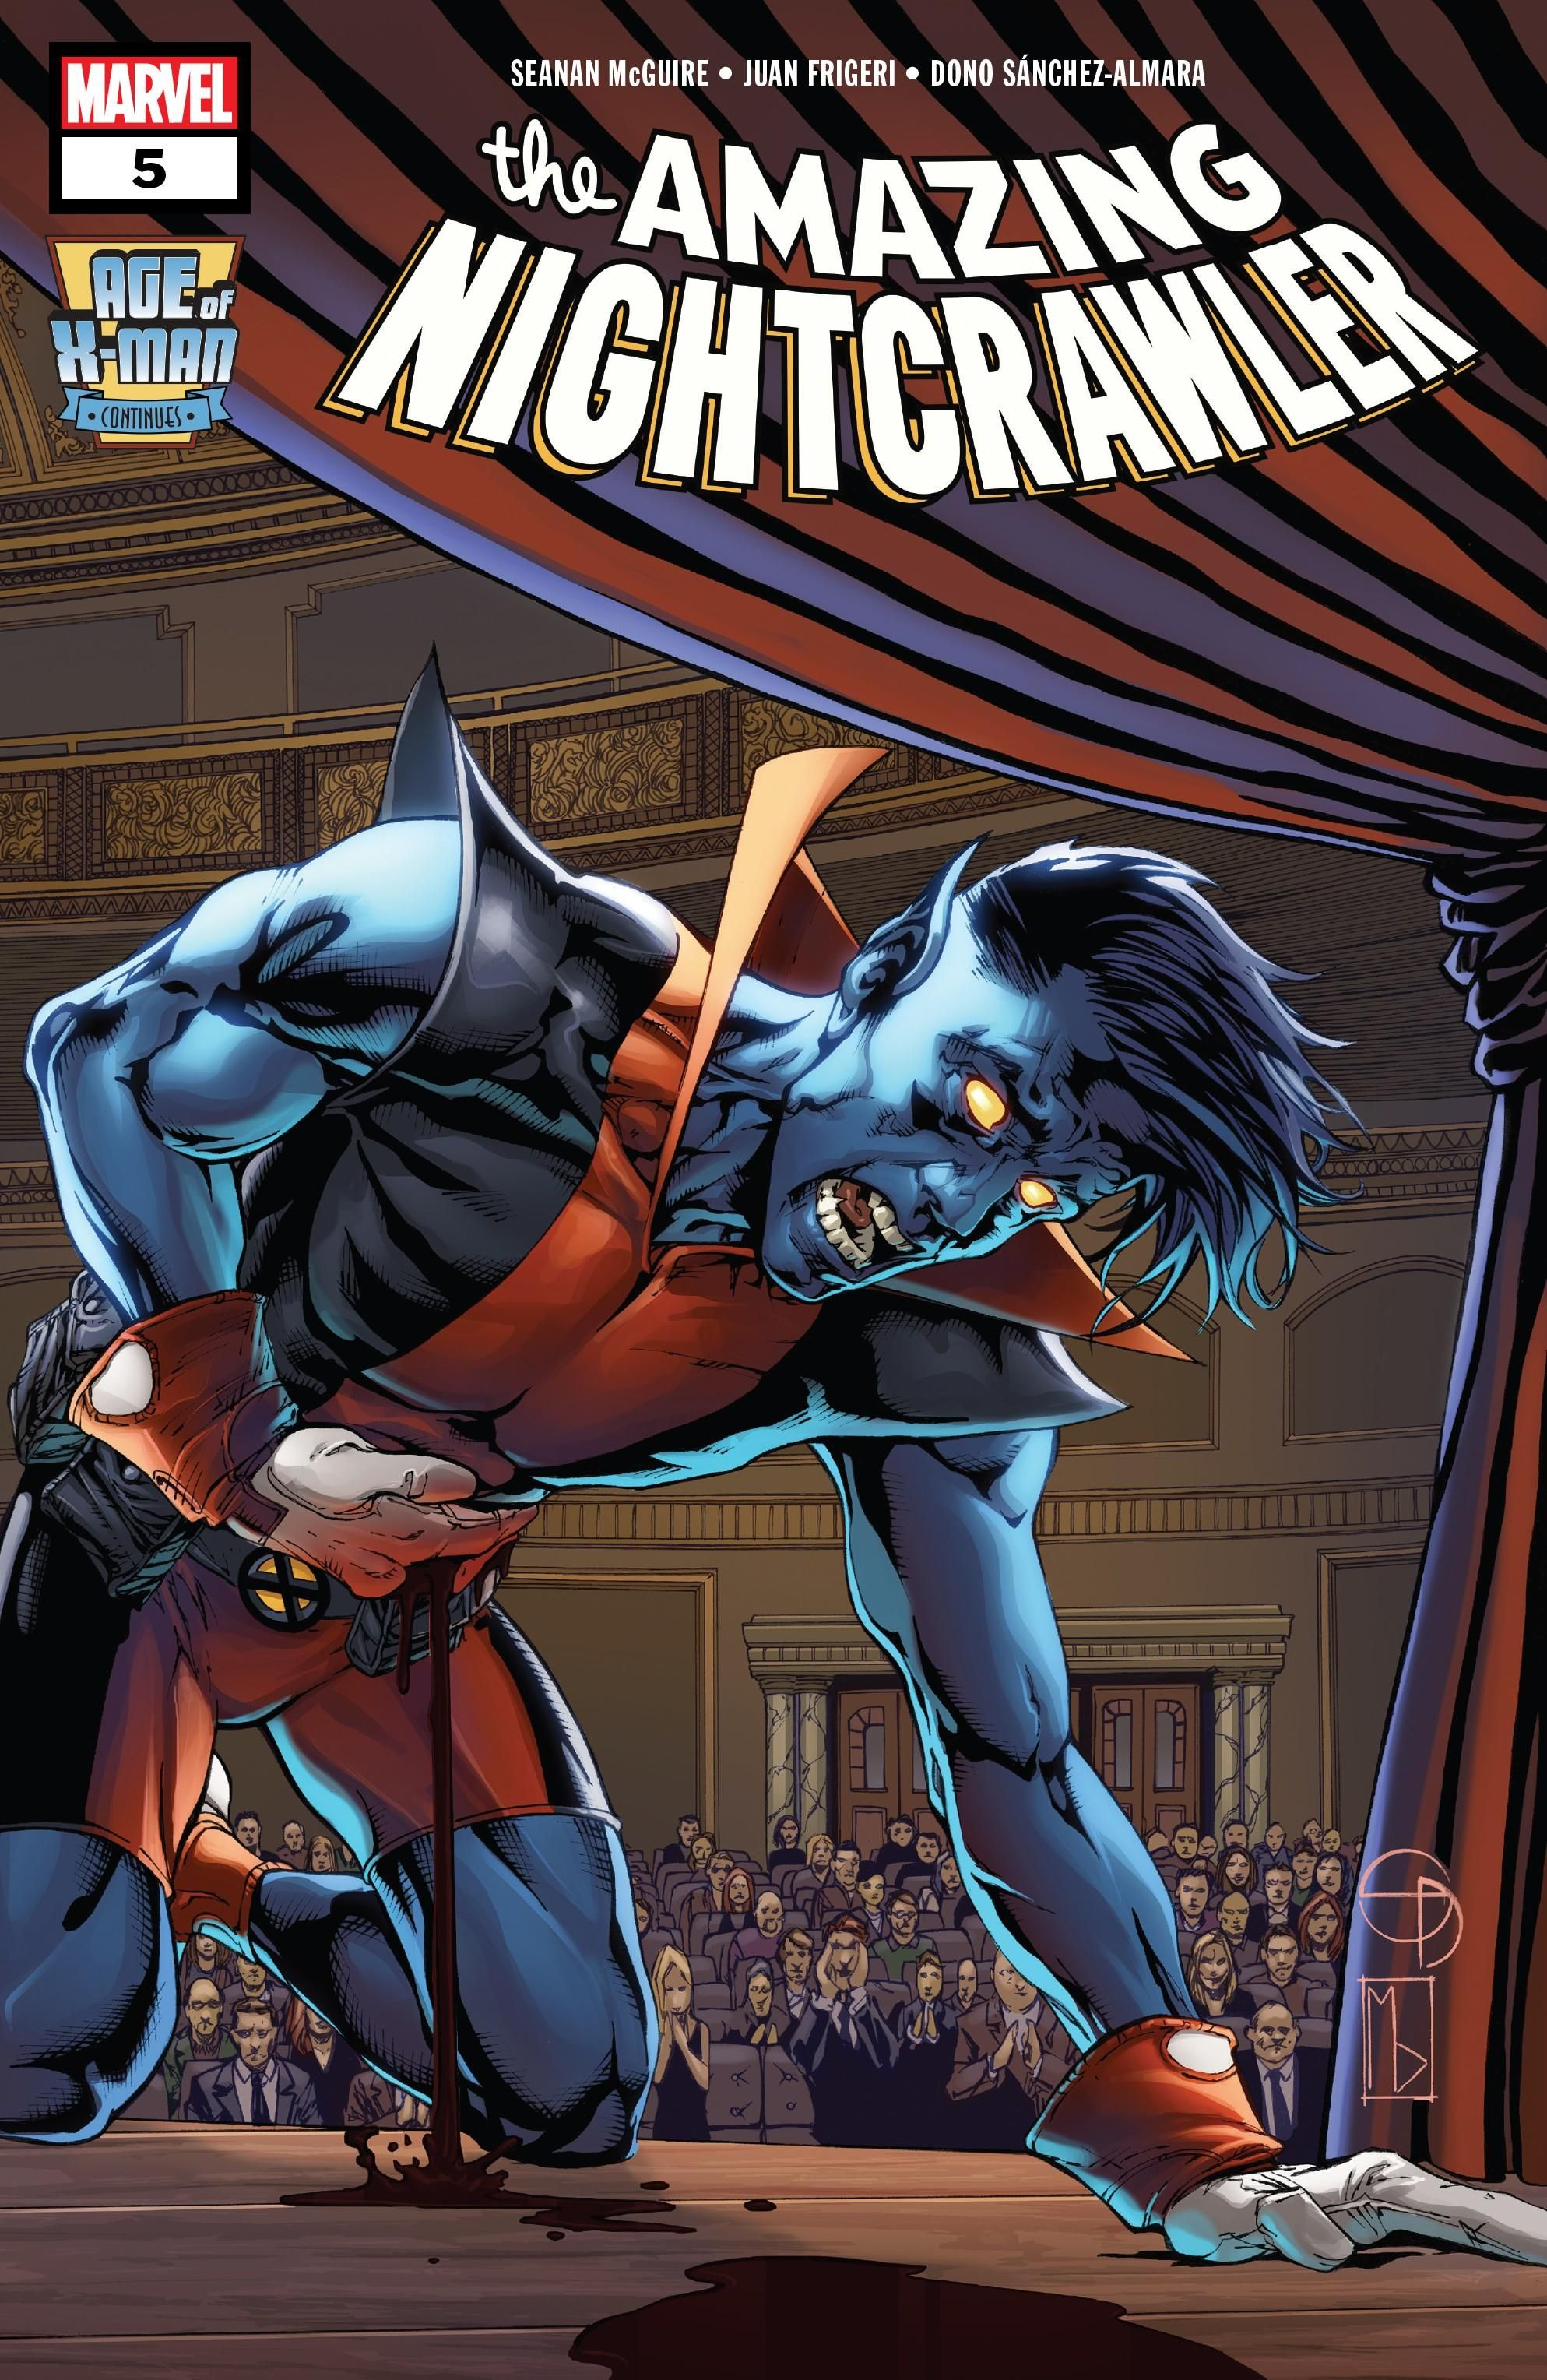 Age of X-Man: The Amazing Nightcrawler Vol 1 5